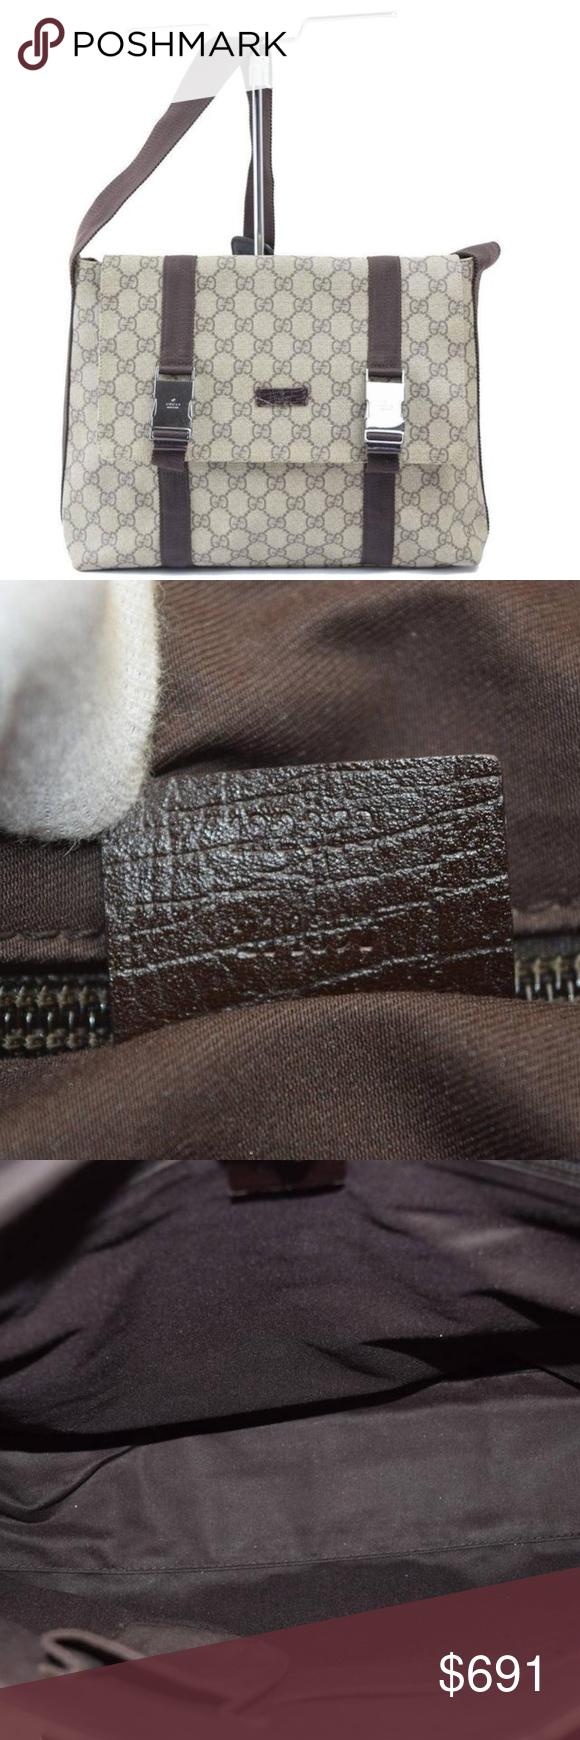 Authentic Gucci Canvas Handbag Authentic Gucci Canvas